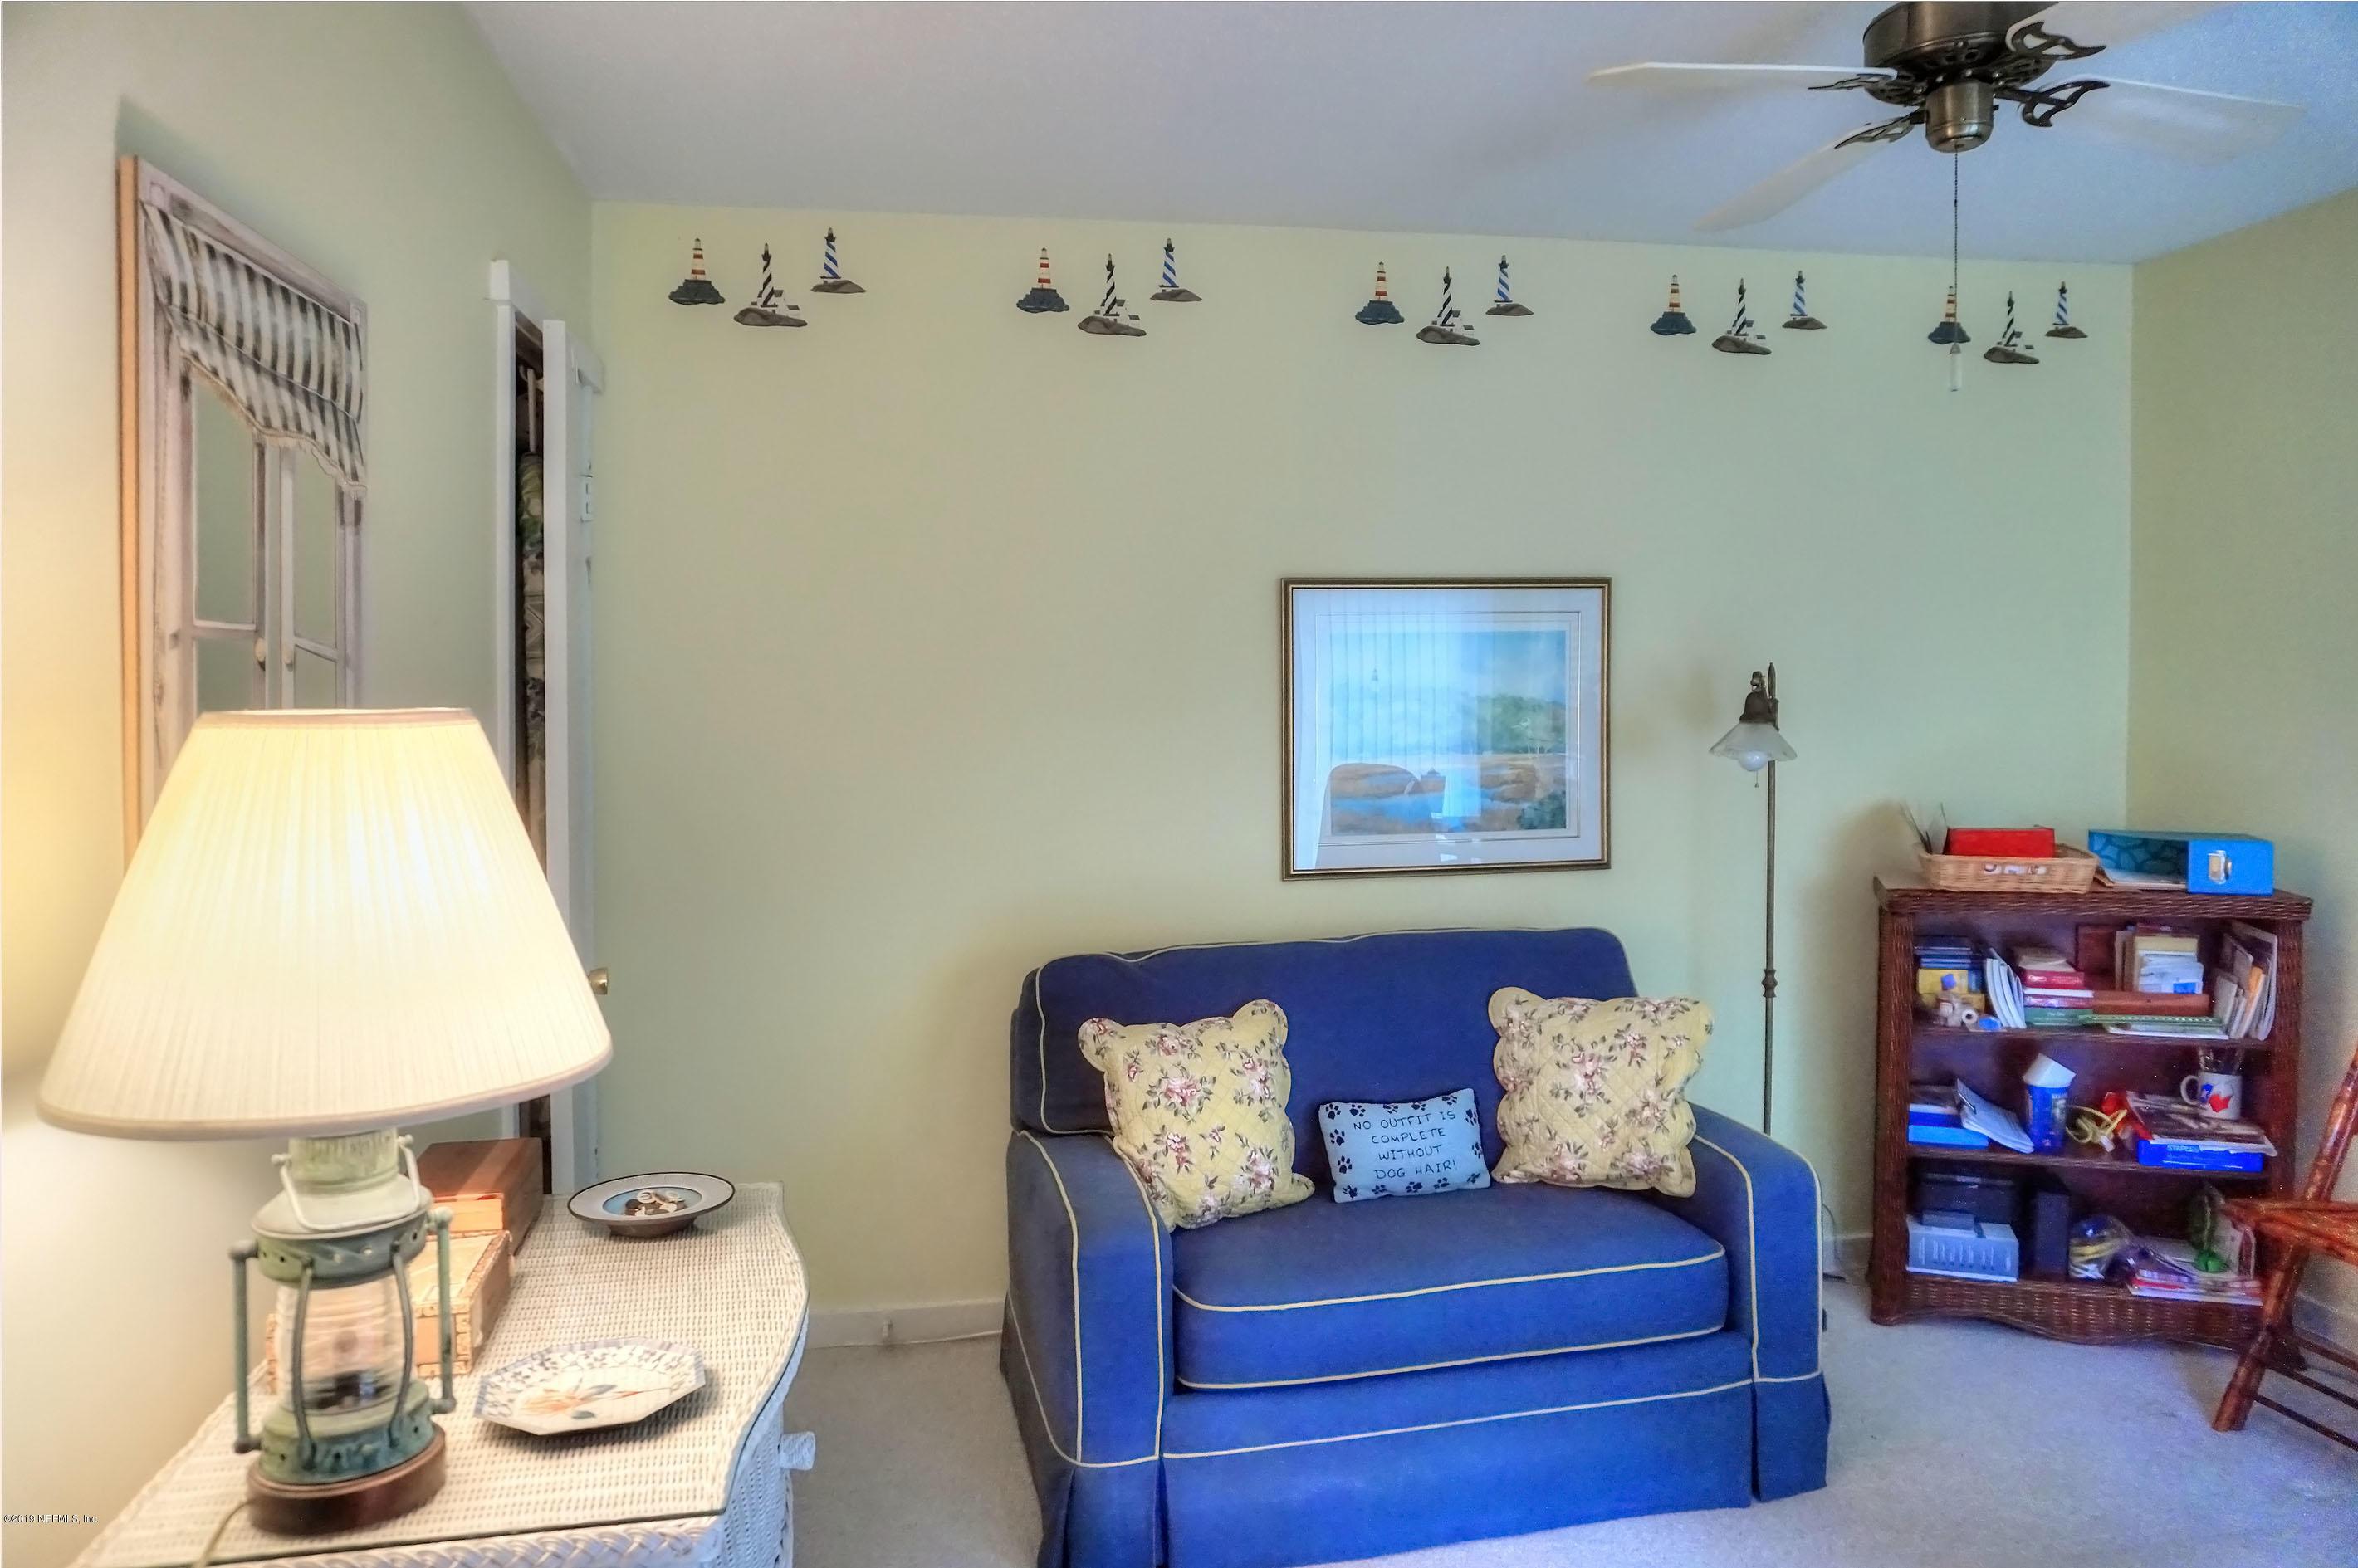 3054 SEA MARSH, FERNANDINA BEACH, FLORIDA 32034, 2 Bedrooms Bedrooms, ,2 BathroomsBathrooms,Condo,For sale,SEA MARSH,1020550